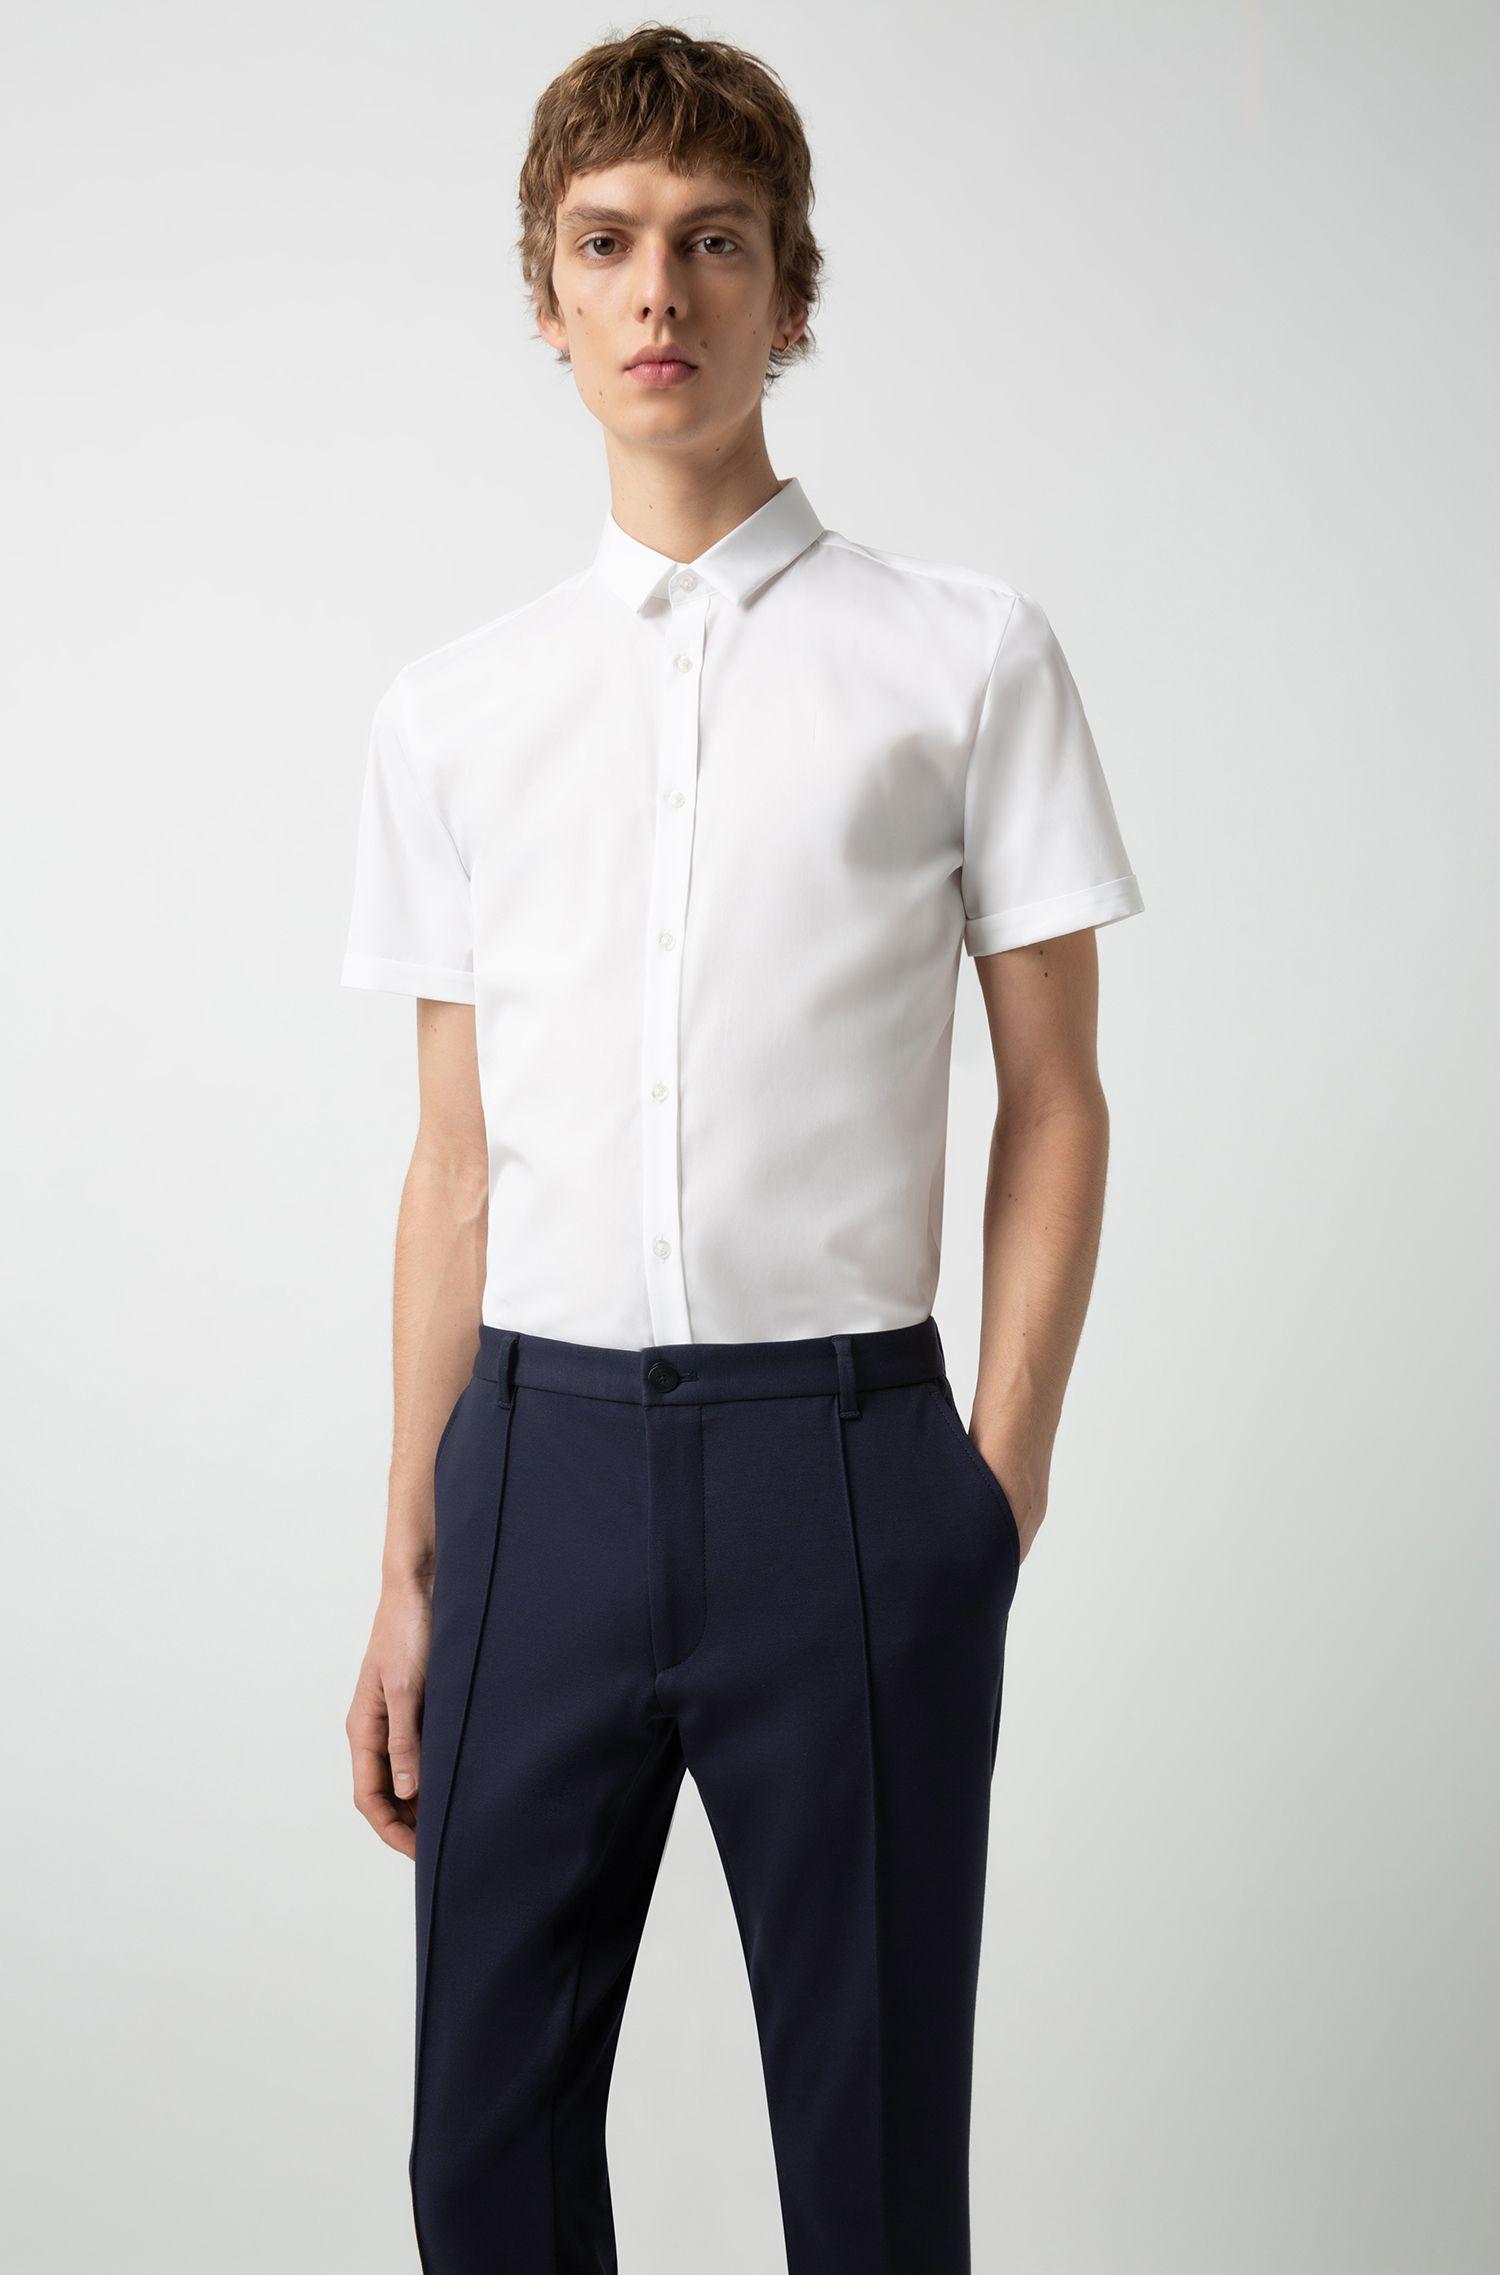 Hugo Boss - Extra-slim-fit trousers in melange jersey - 3